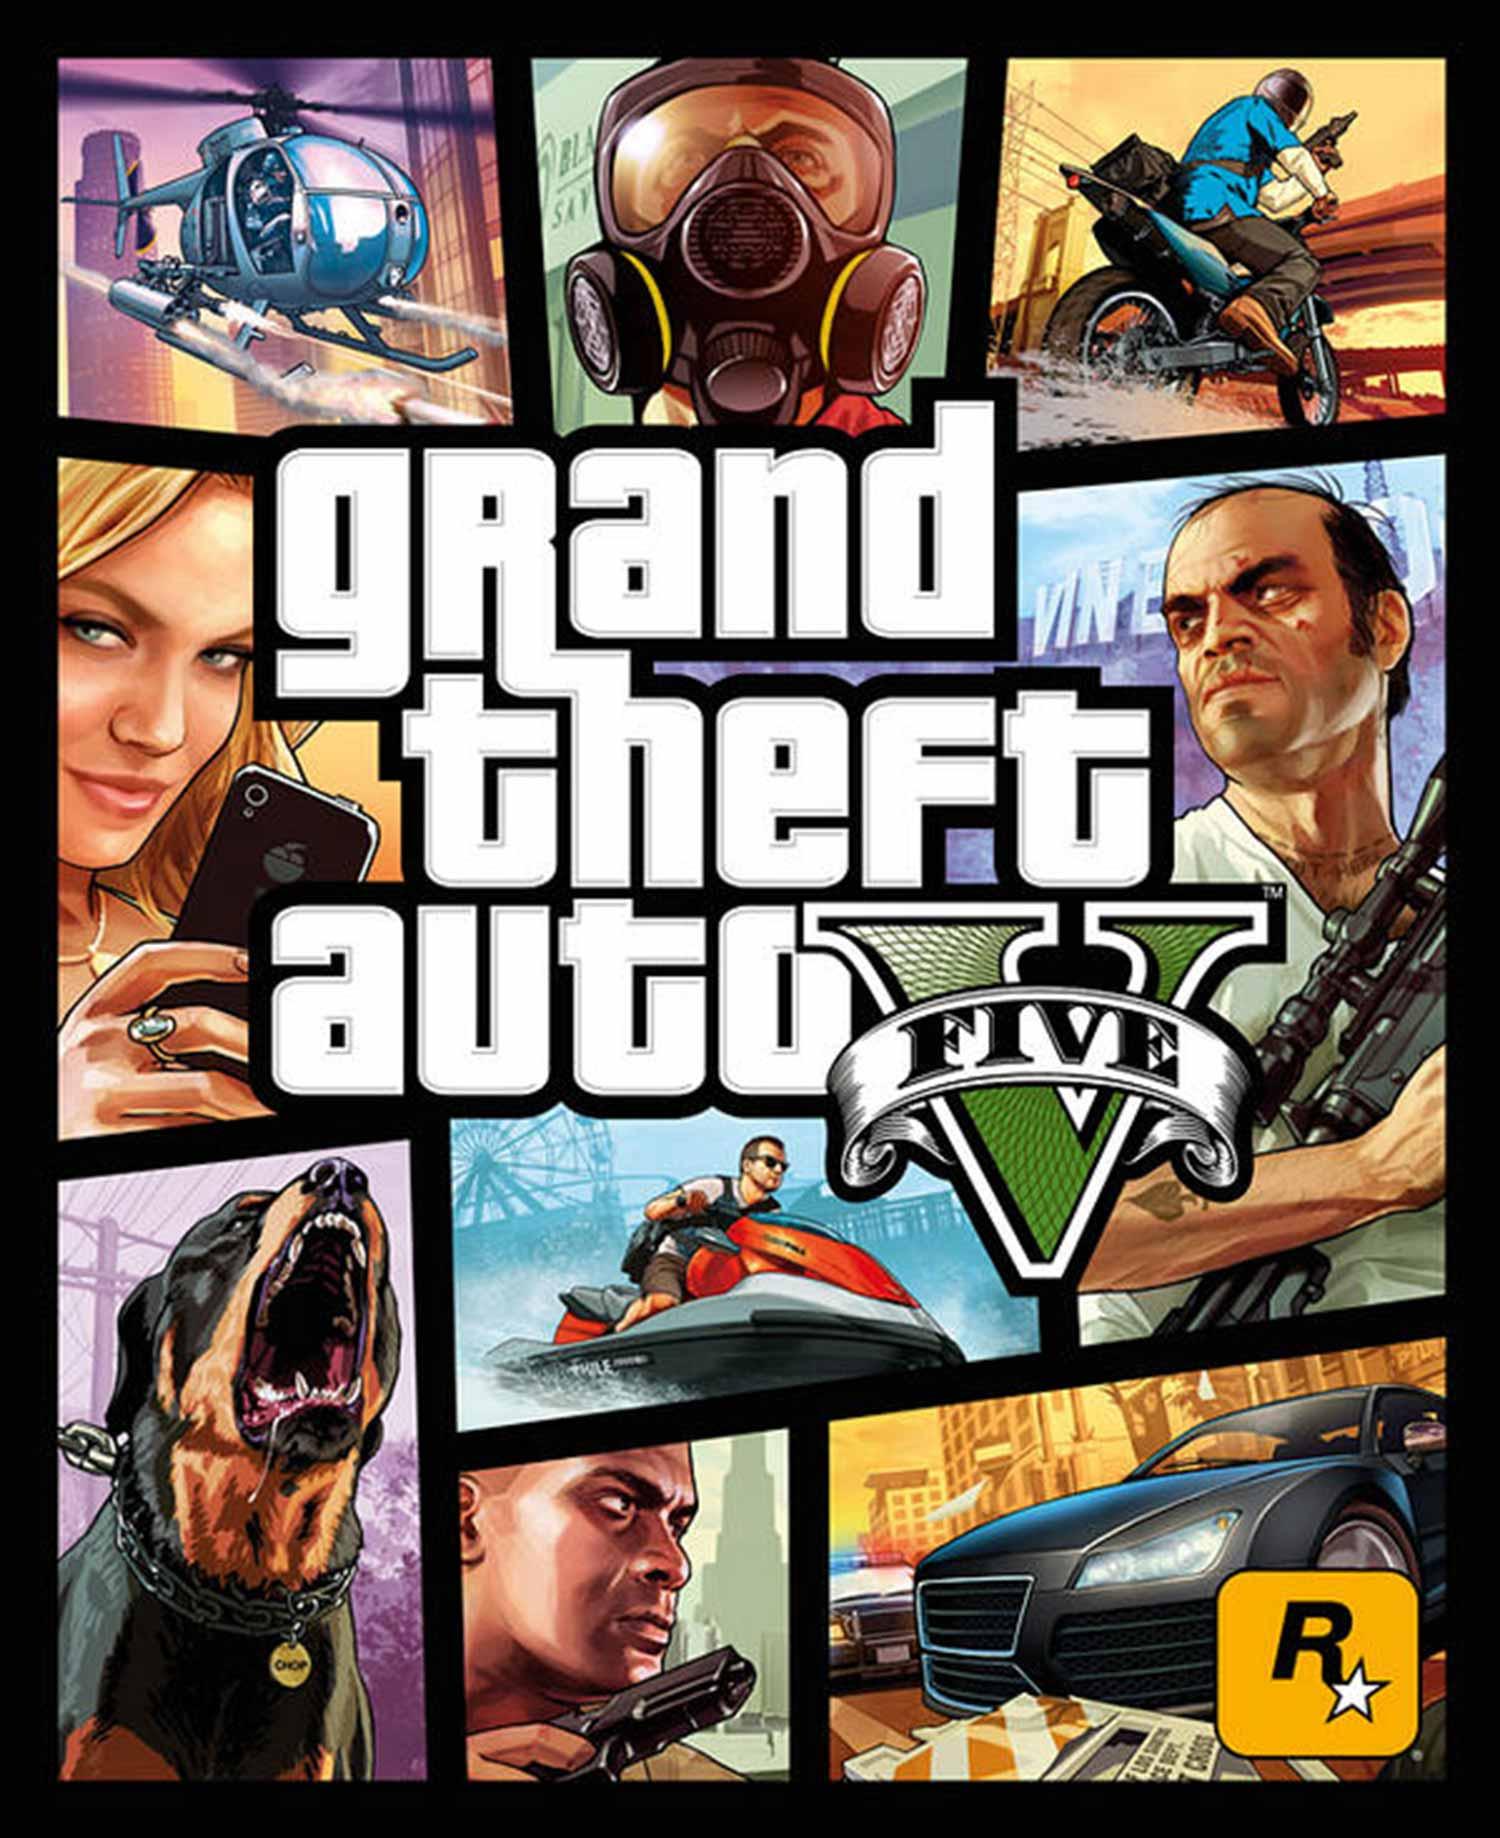 3 Days in, $1 Billion Up for Rockstar Games